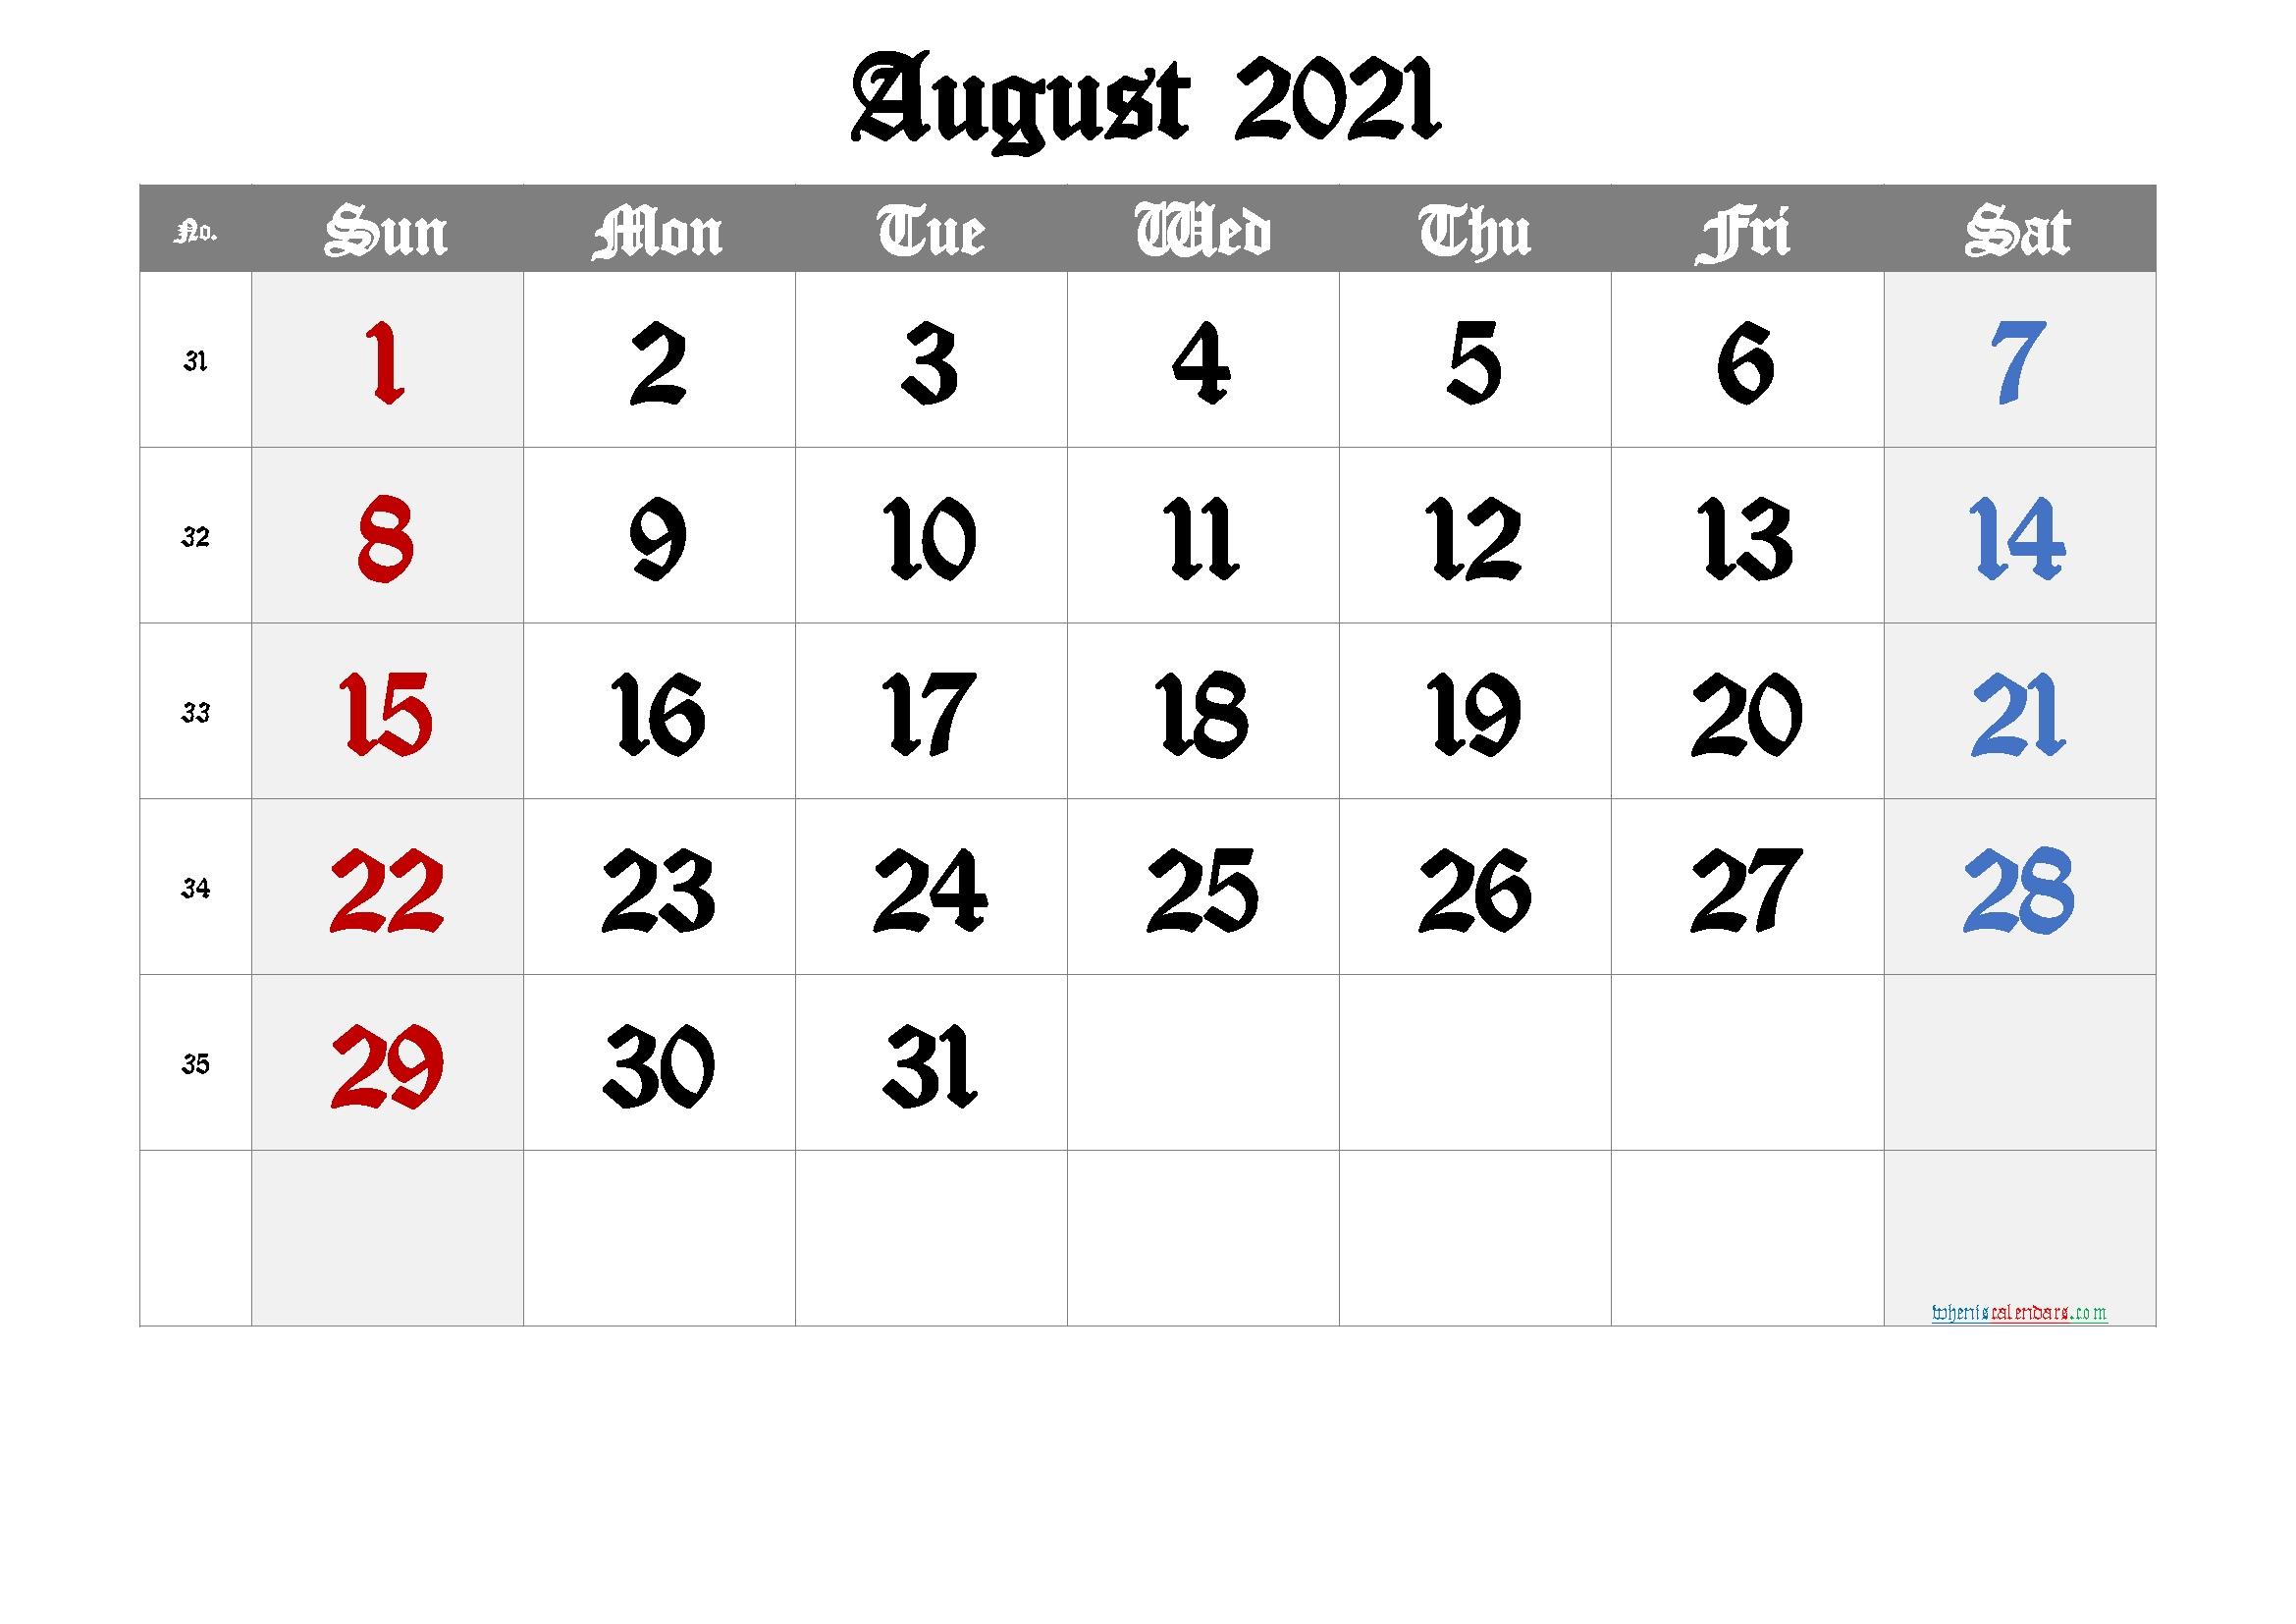 Free Printable August 2021 Calendar - 6 Templates | Free Printable 2020 Monthly Calendar With August 2021 Calendar With Holidays Usa